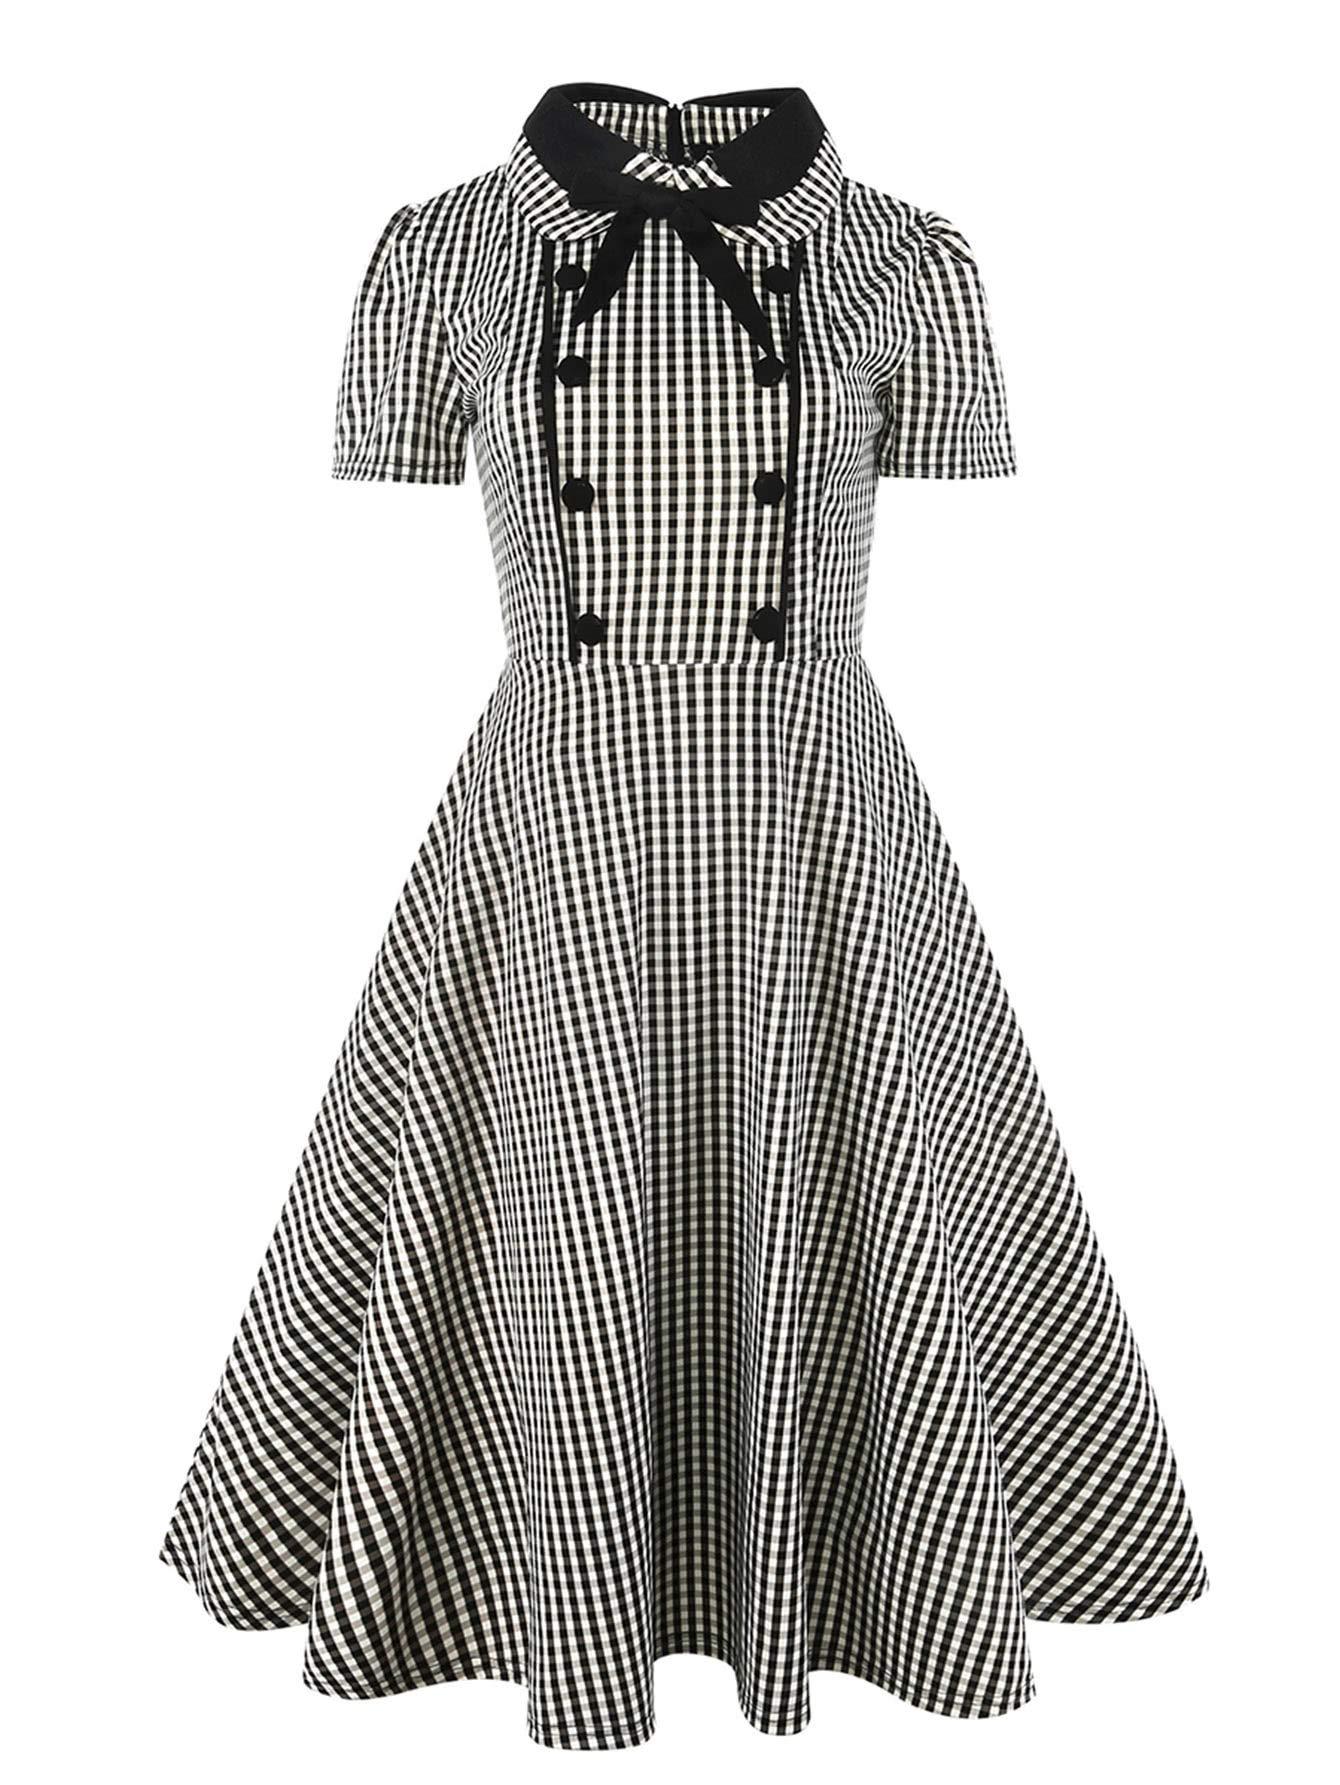 ab47c3c62 SheIn Women's Vintage Short Sleeve Peter Pan Collar Checkered Casual Flare  Dress Medium Black